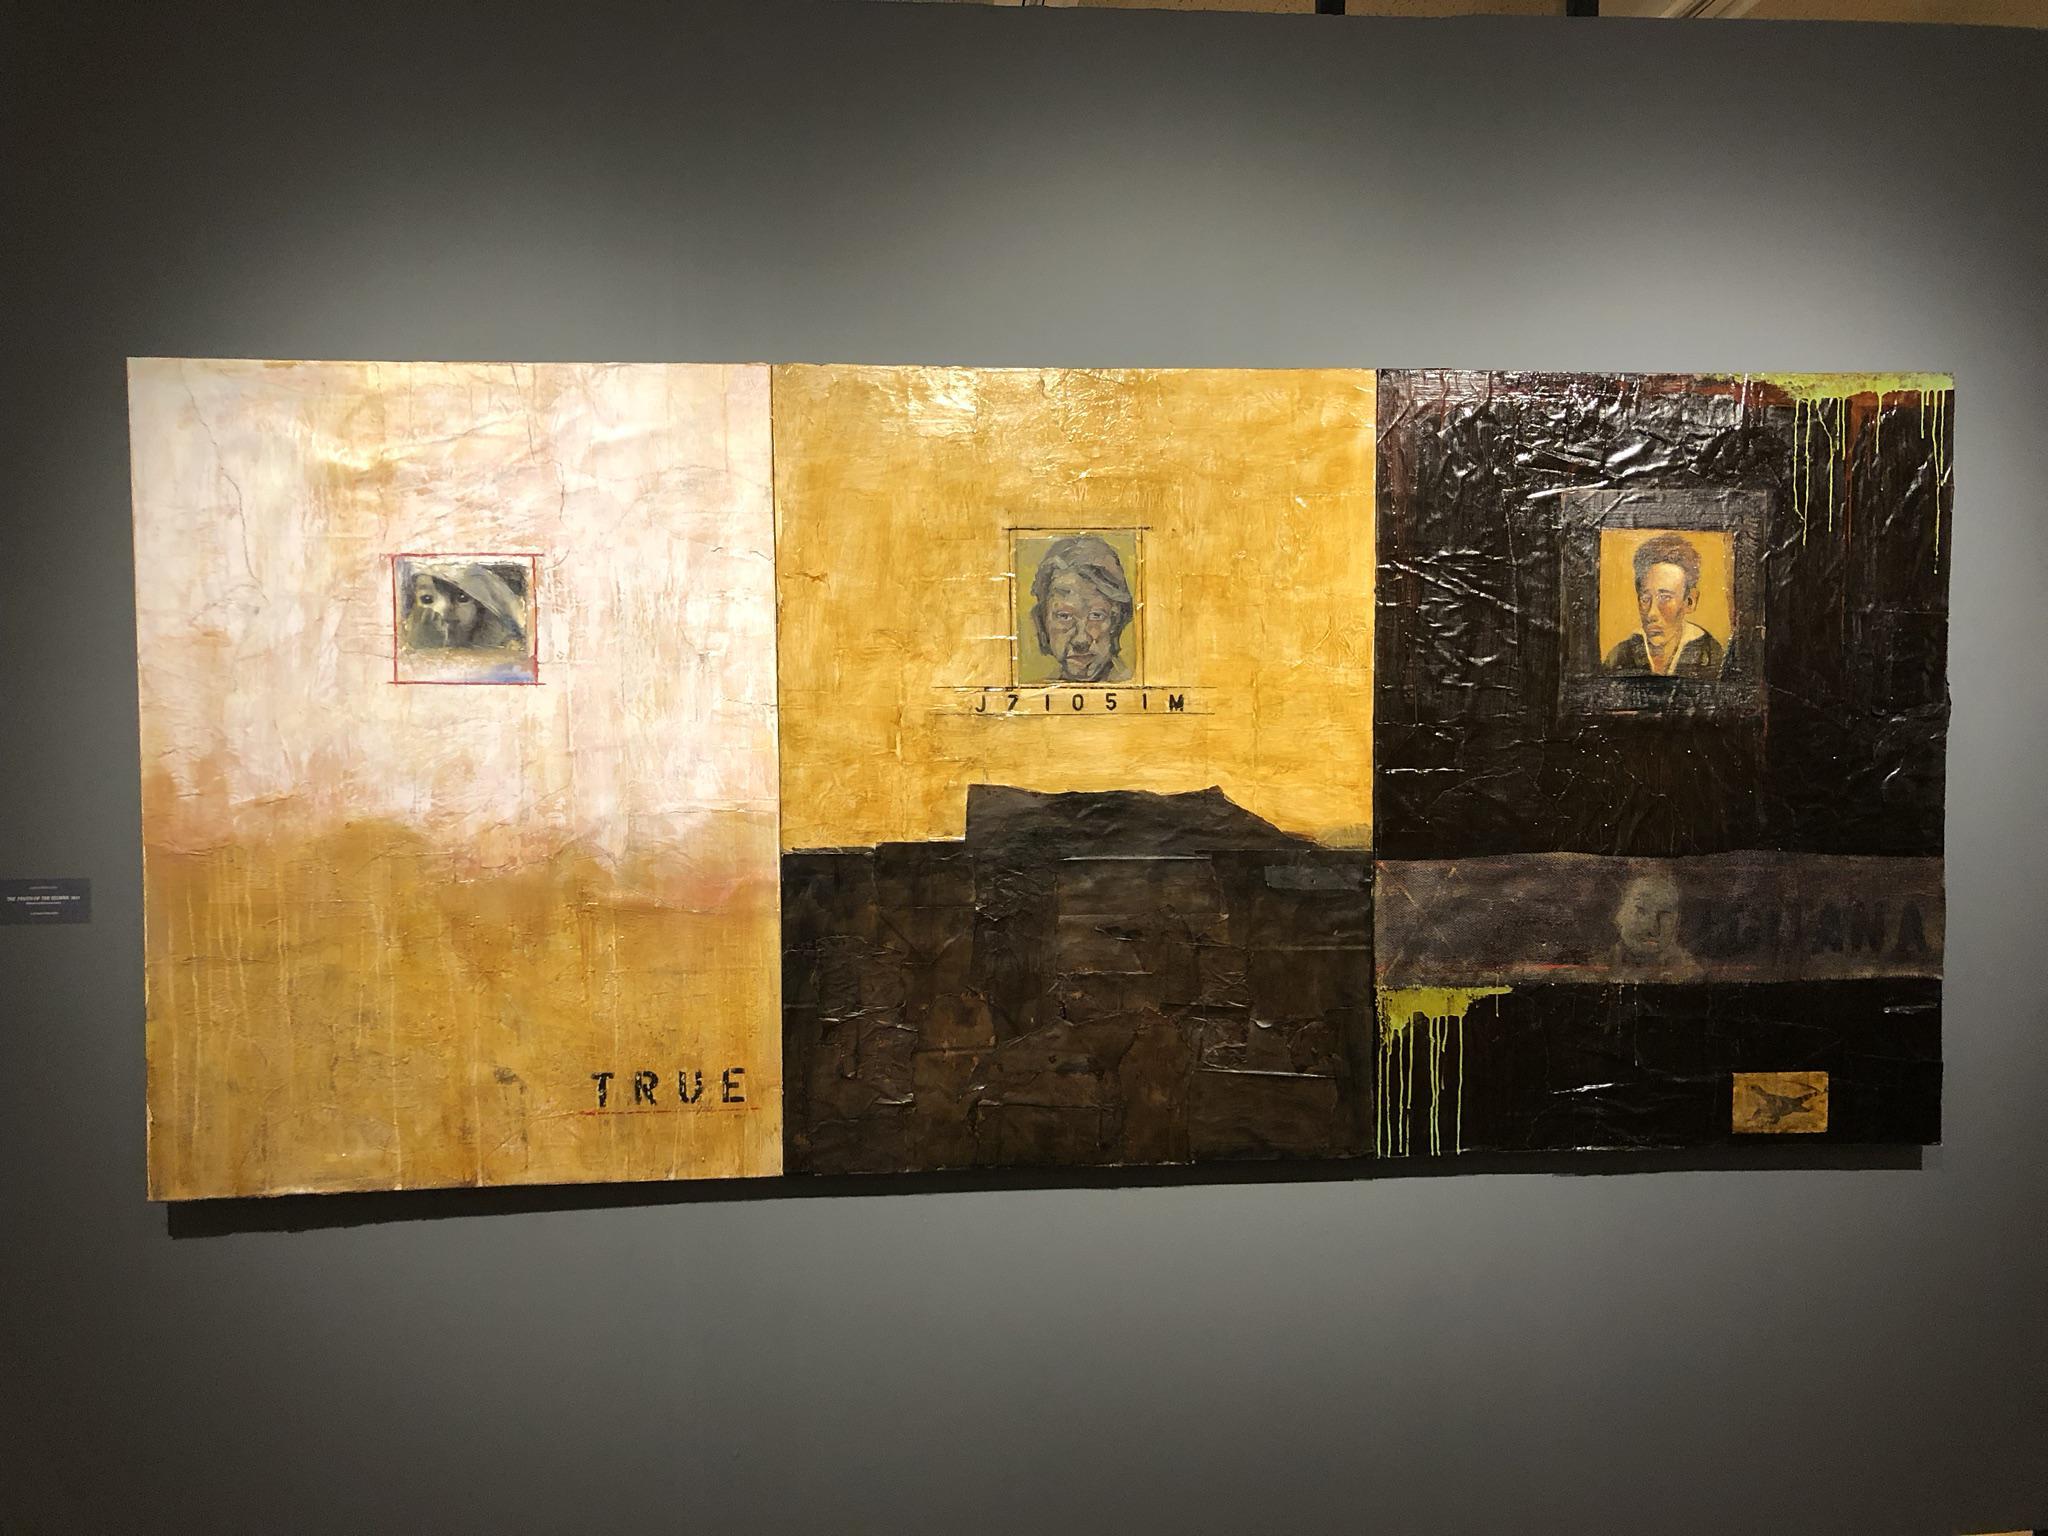 State of the Arts: John Mellencamp Brings Somber Artwork to ...